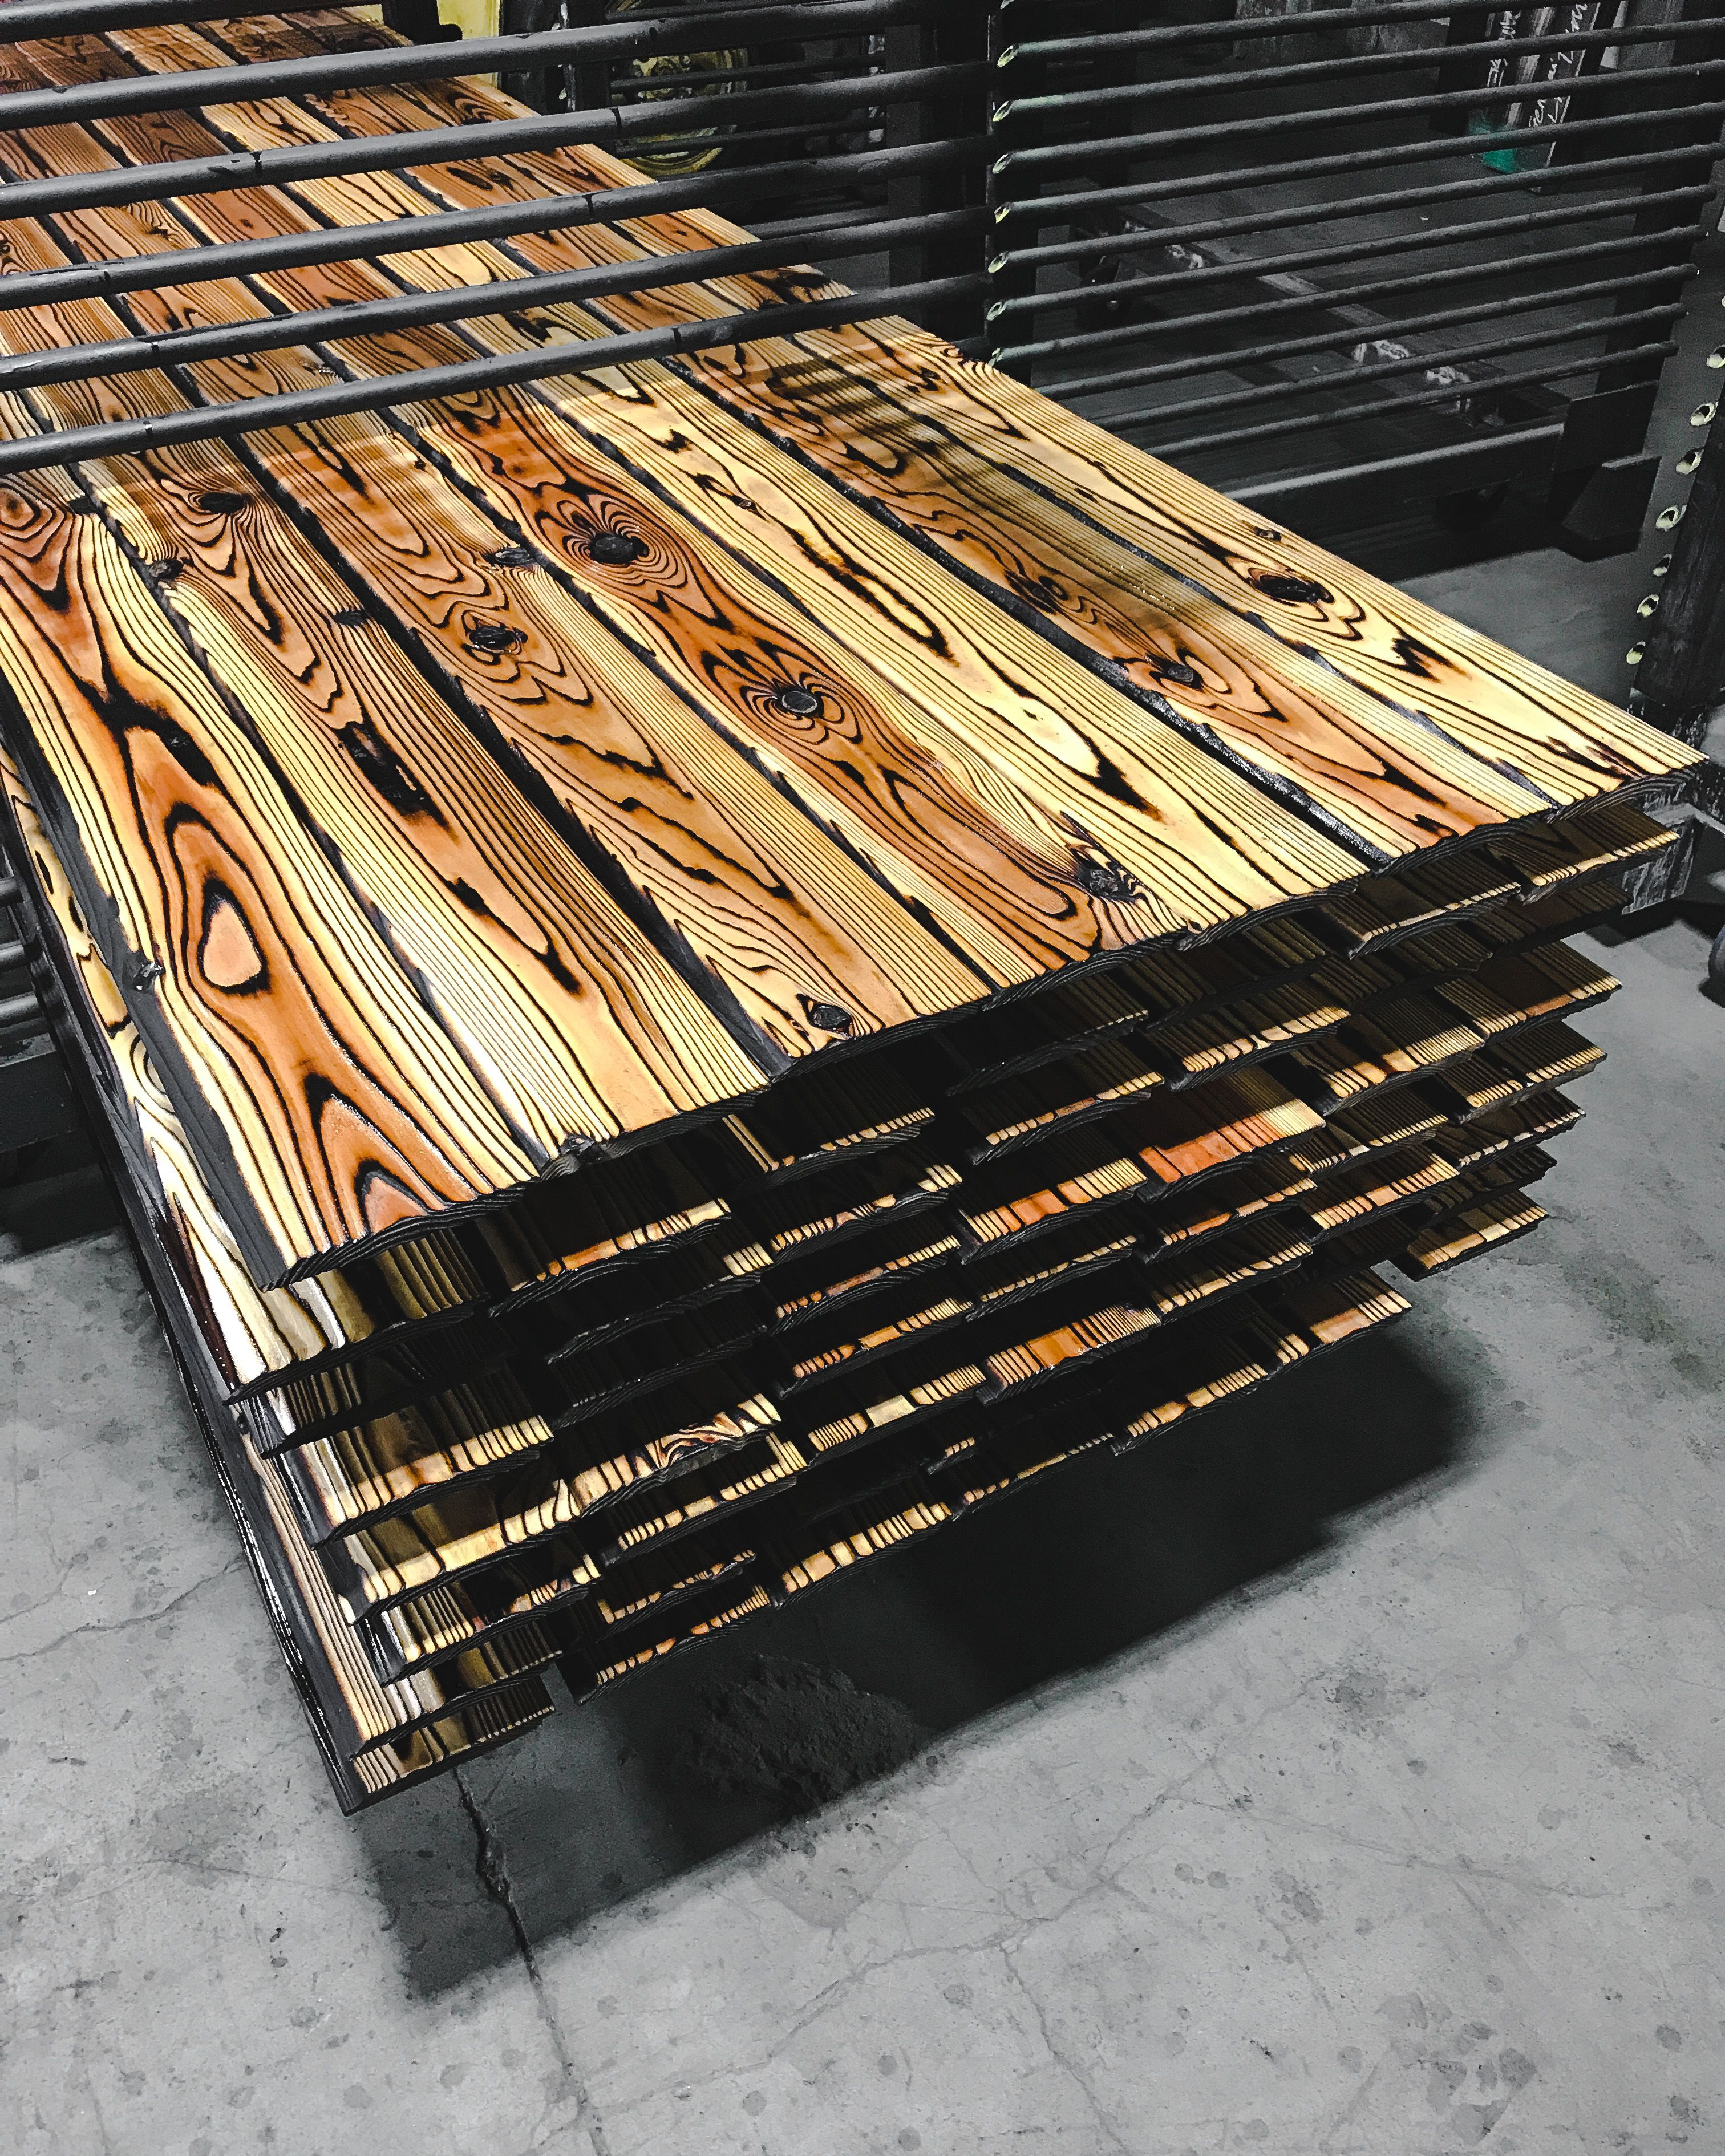 Pika Pika Japanese Burnt Cedar Siding And Flooring For